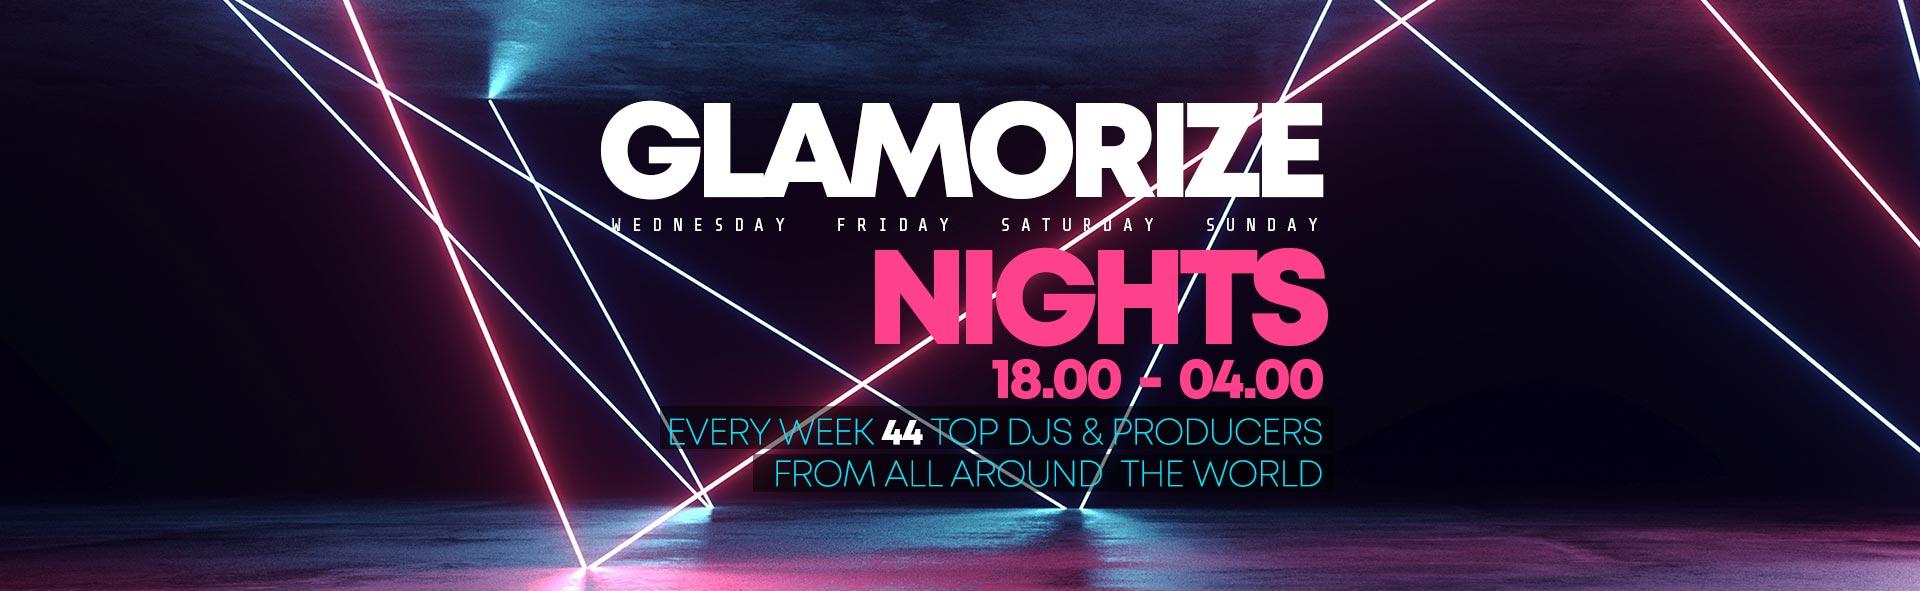 Radio Glamorize Nights